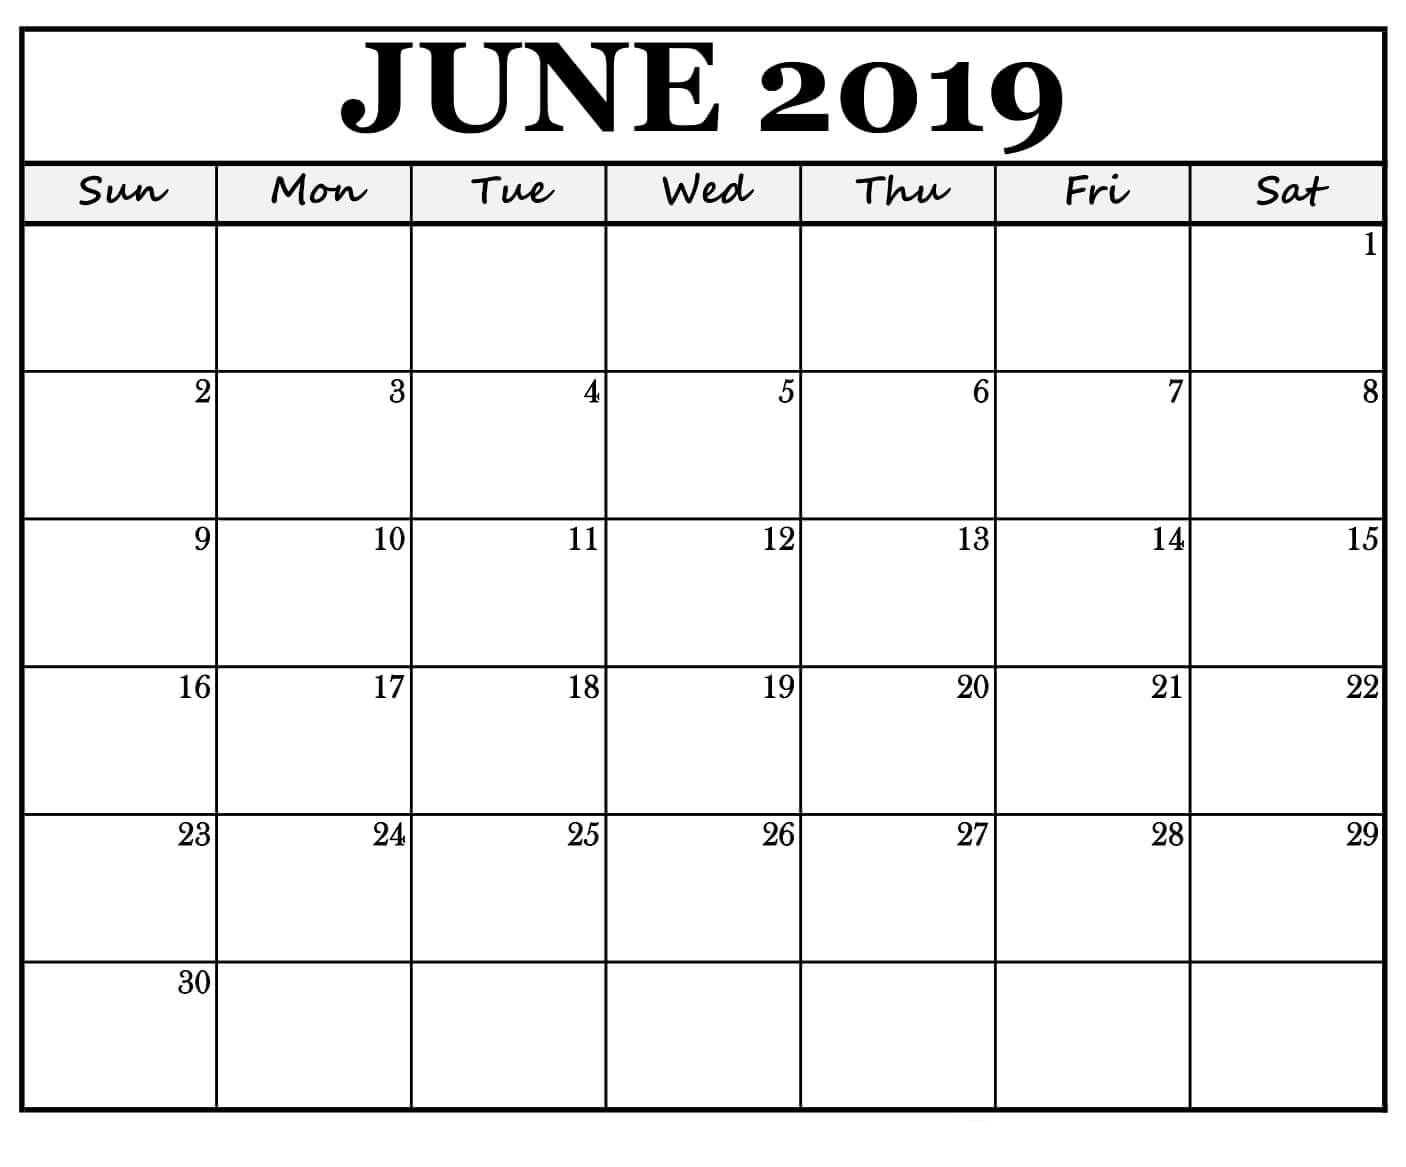 Waterproof June 2019 Calendar Wallpaper For Desktop Iphone Calendar 2019 Waterproof